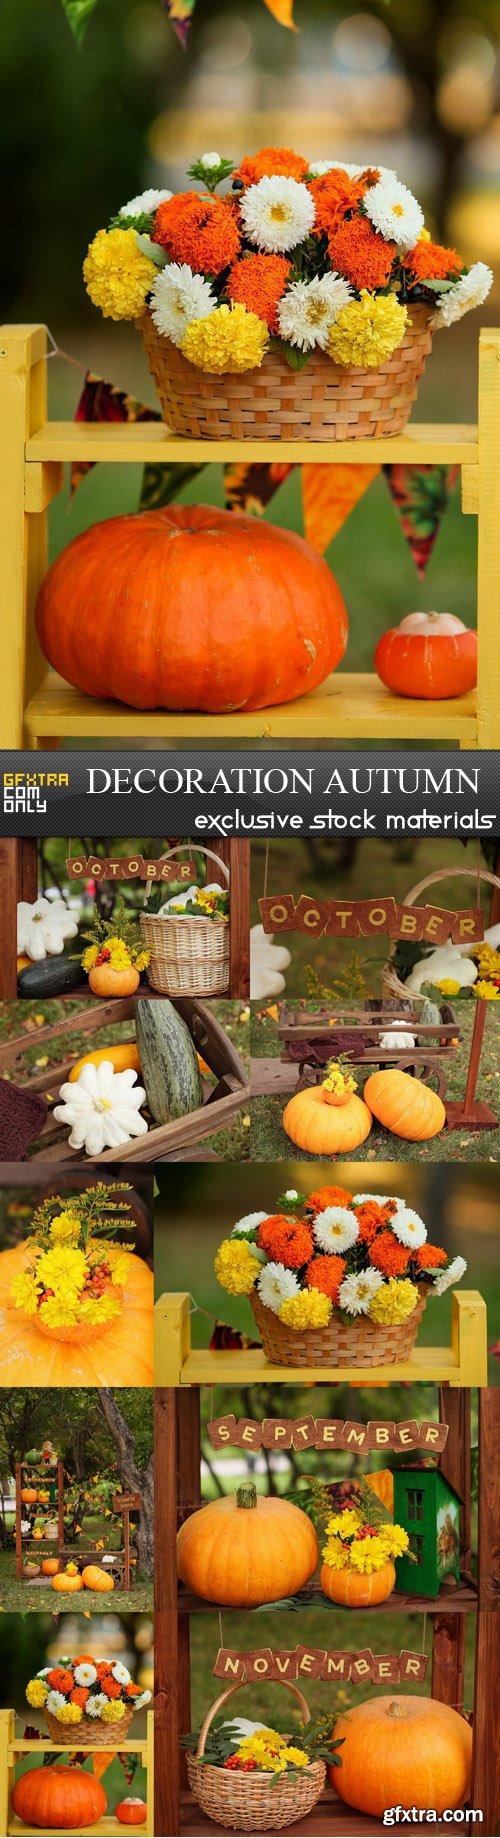 Decoration Autumn - 10 UHQ JPEG